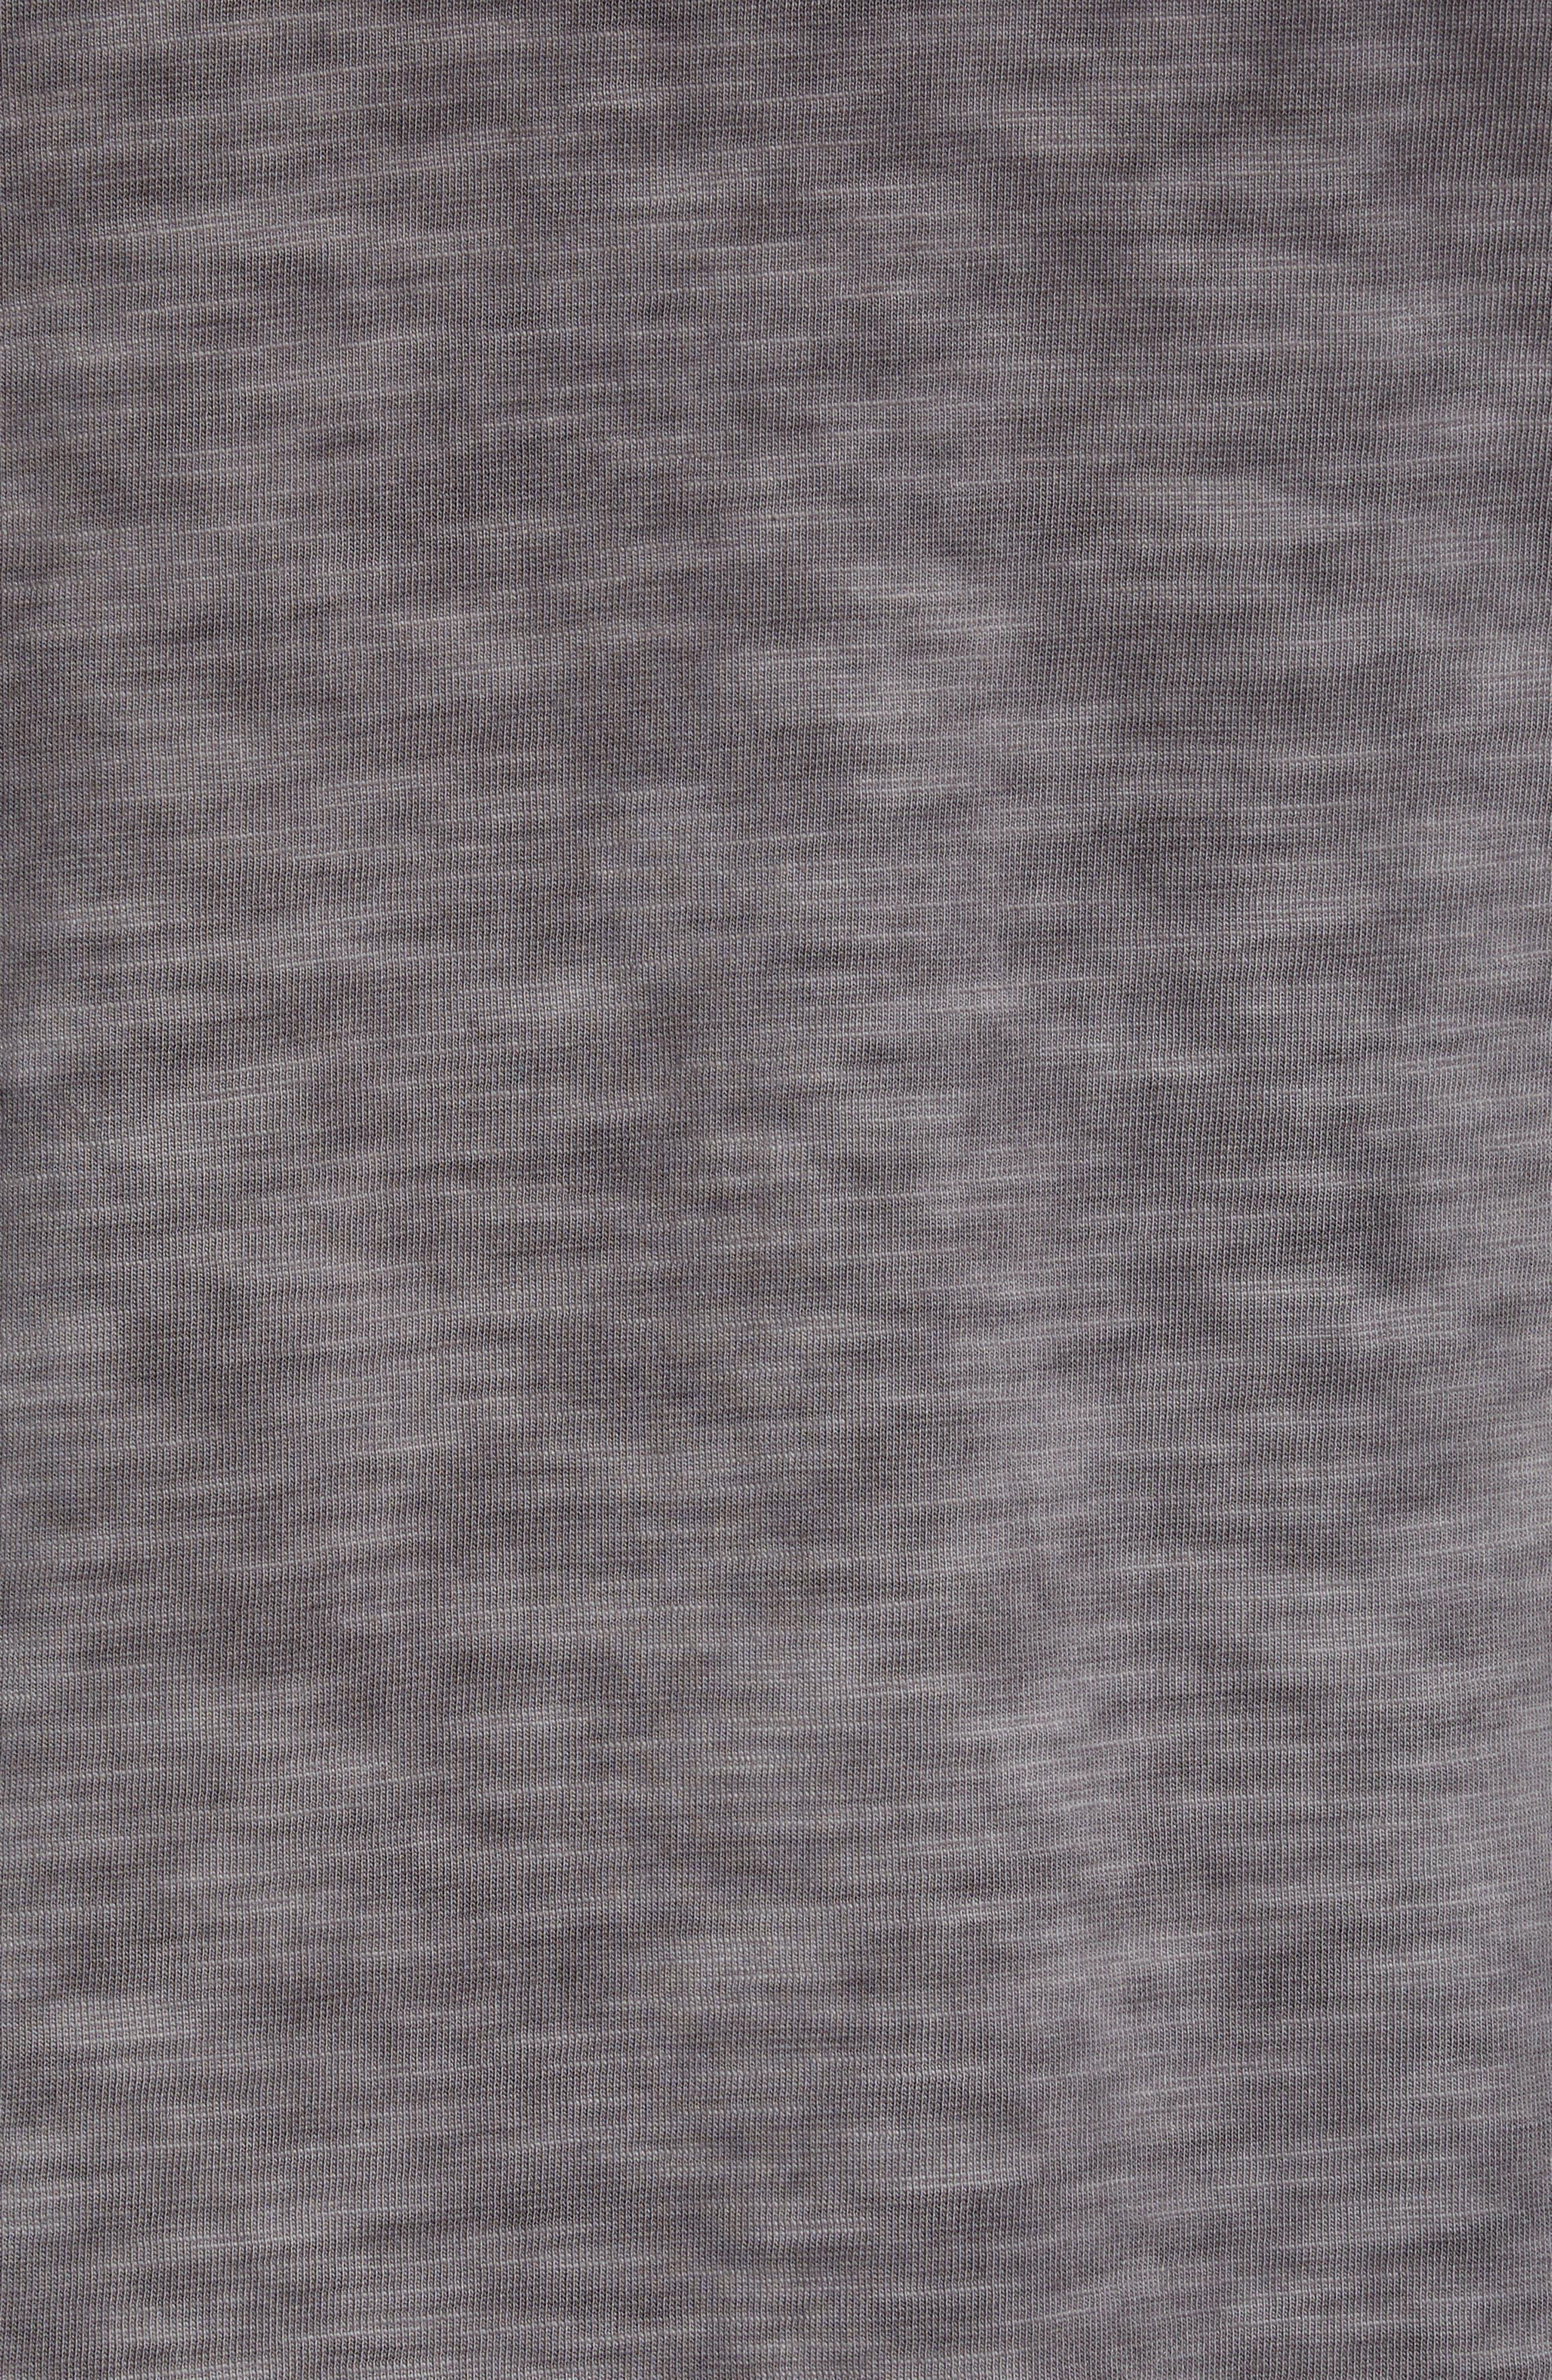 Suncoast Shores Long Sleeve V-Neck T-Shirt,                             Alternate thumbnail 5, color,                             COAL